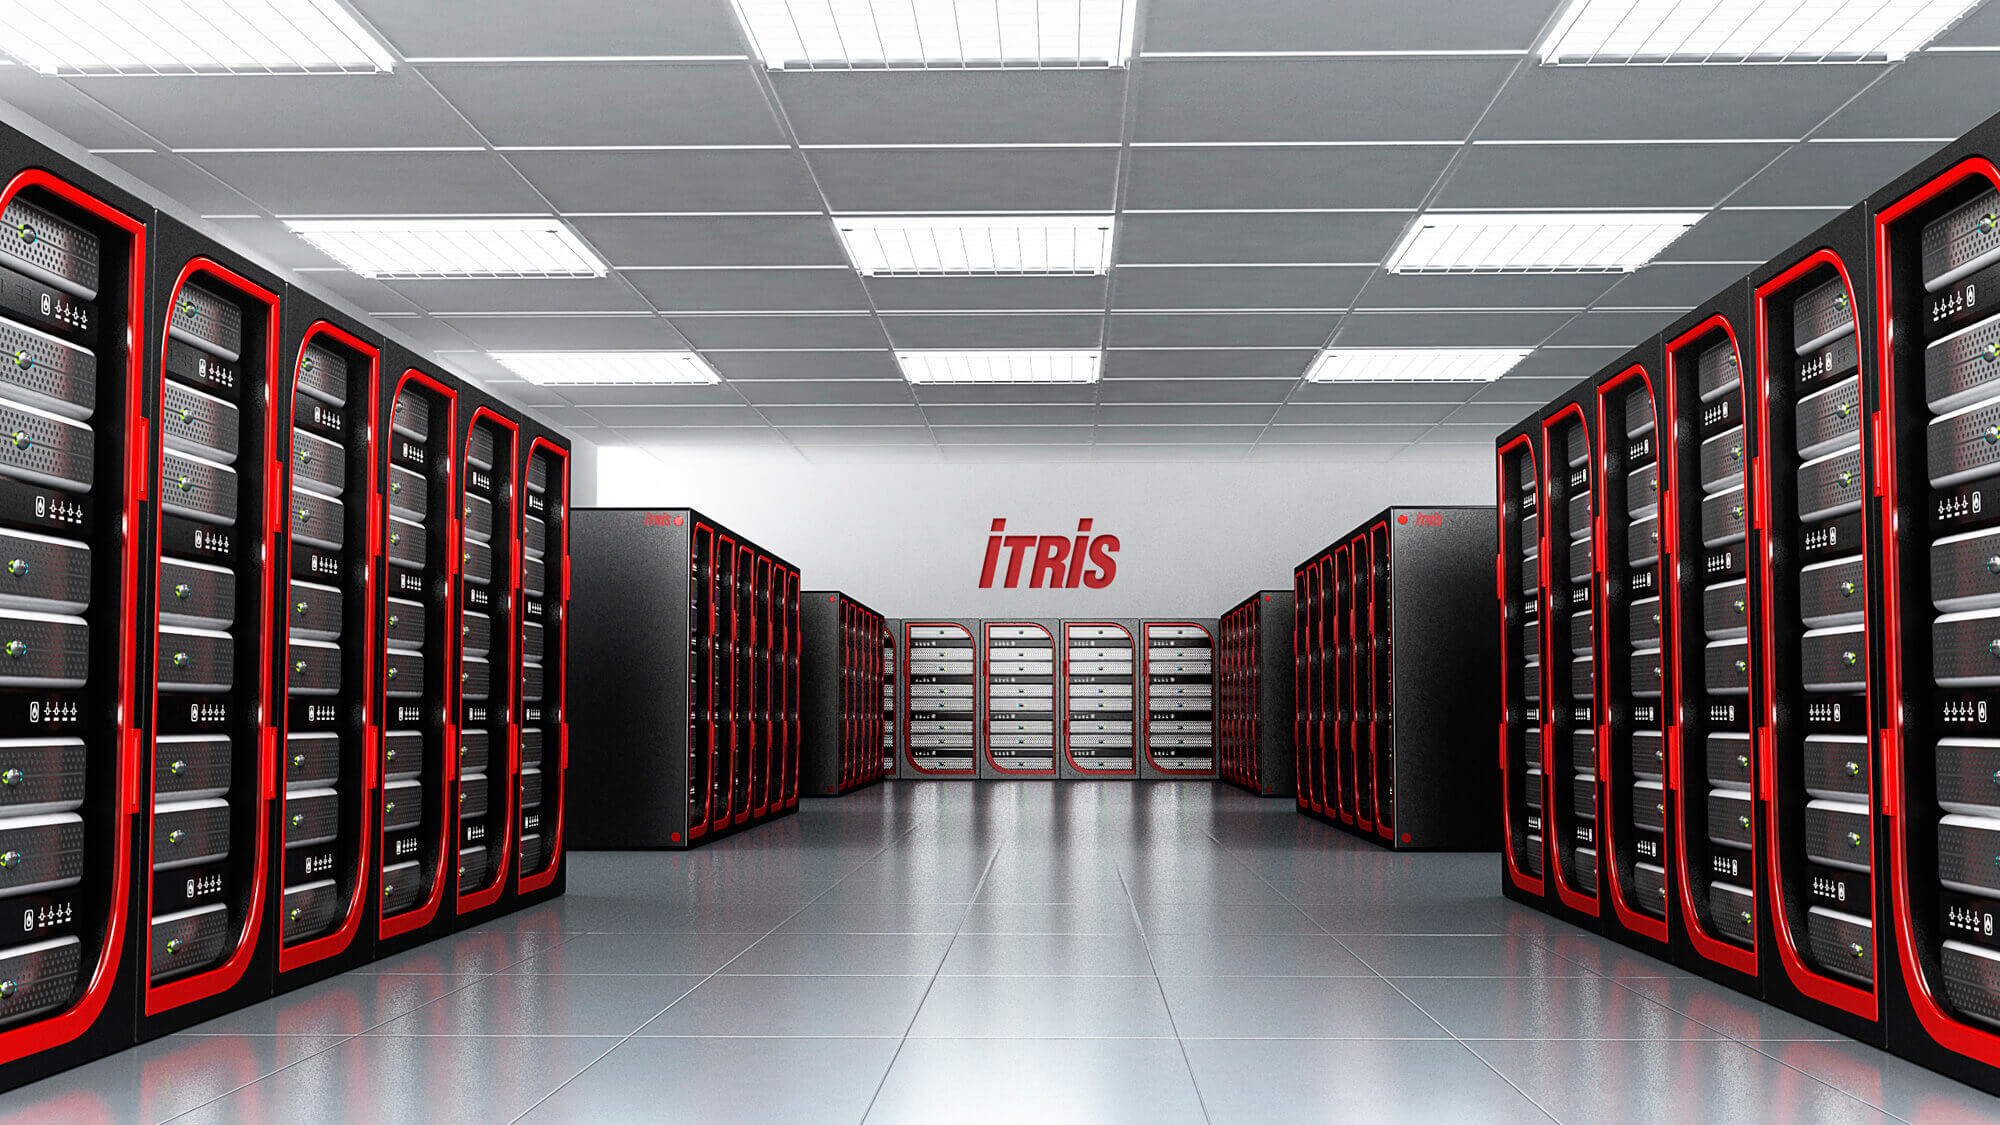 itris server header